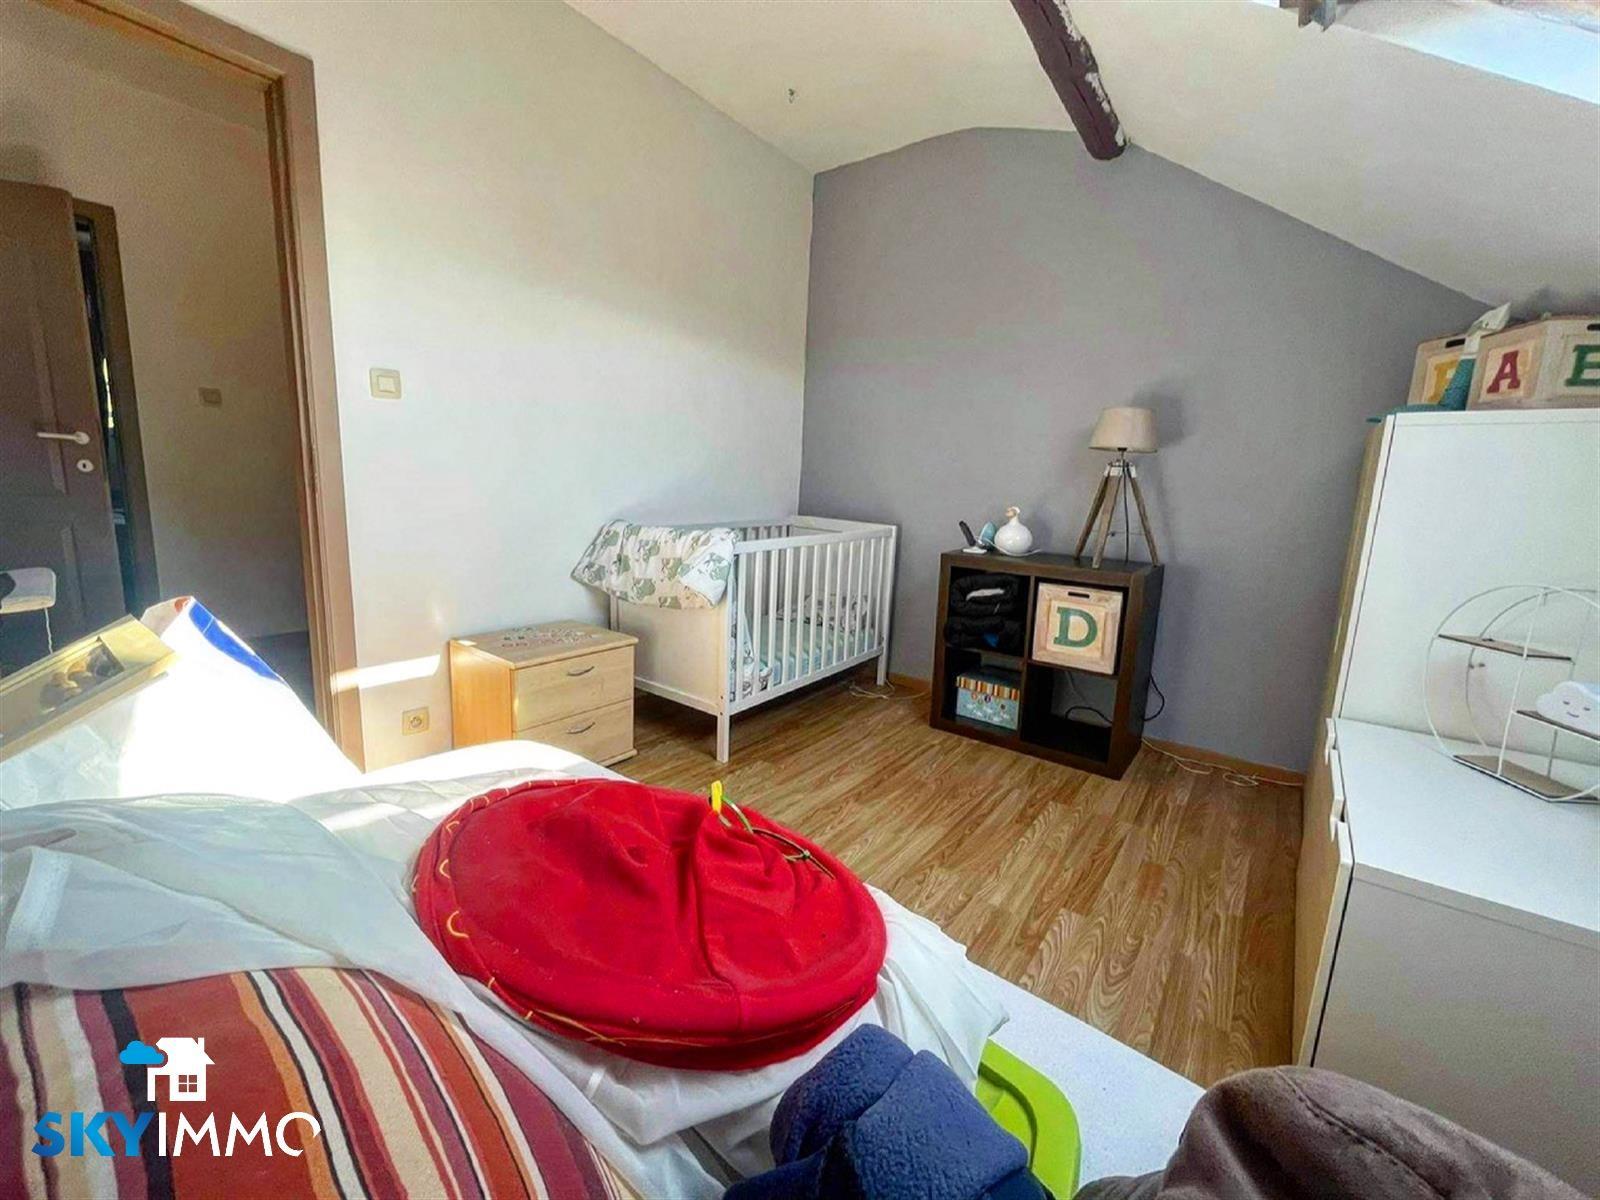 Maison - Seraing Jemeppesur-Meuse - #4343977-19